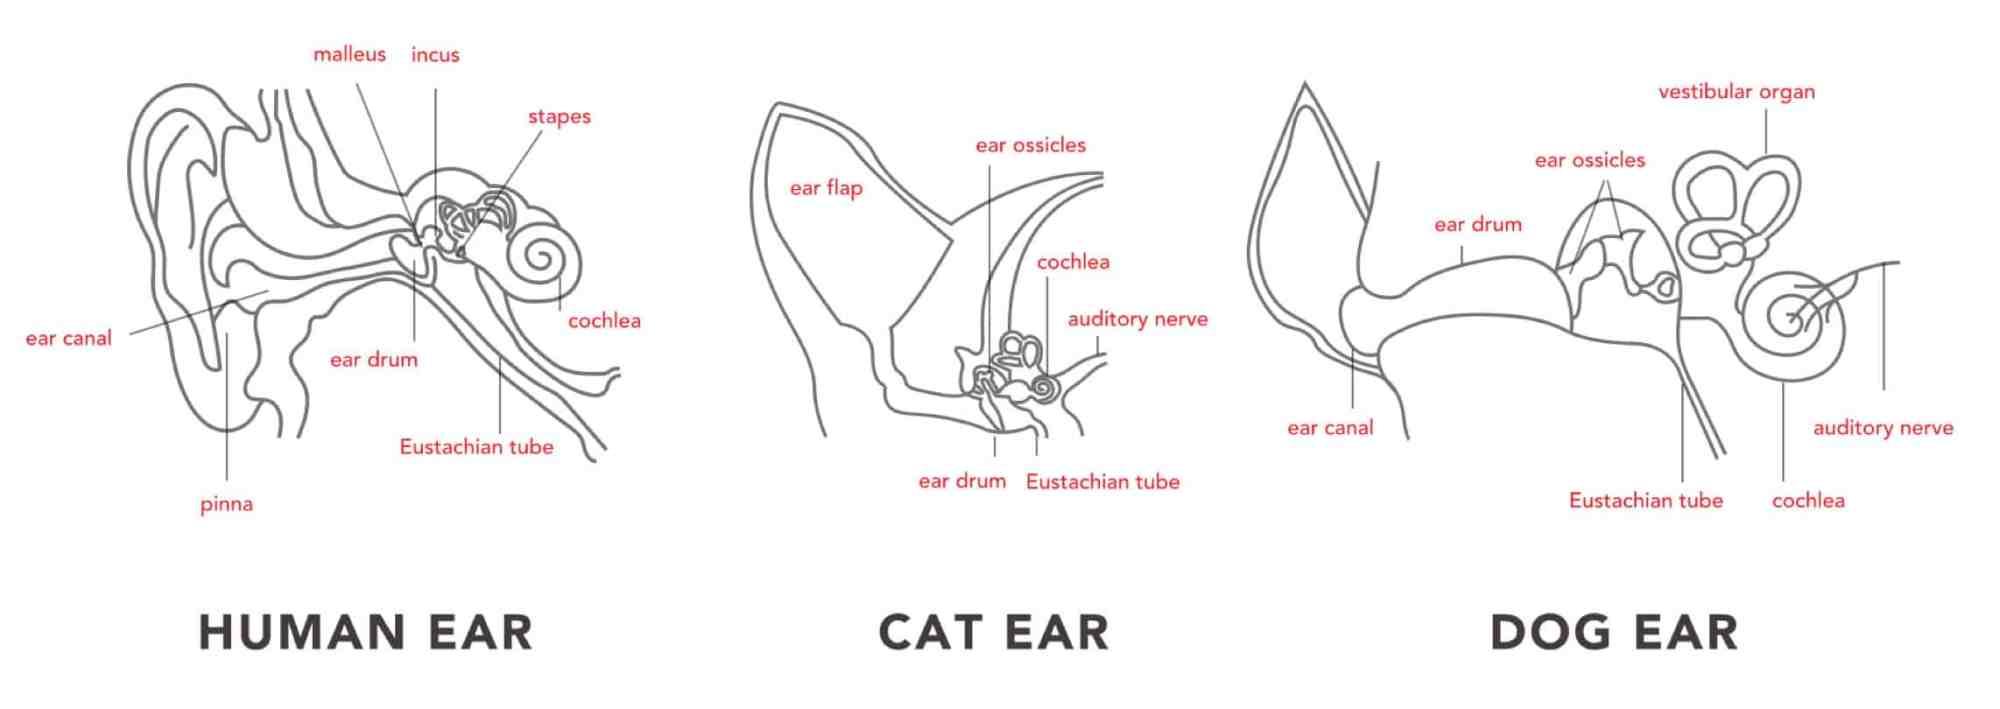 hight resolution of ear anatomy human cat dog